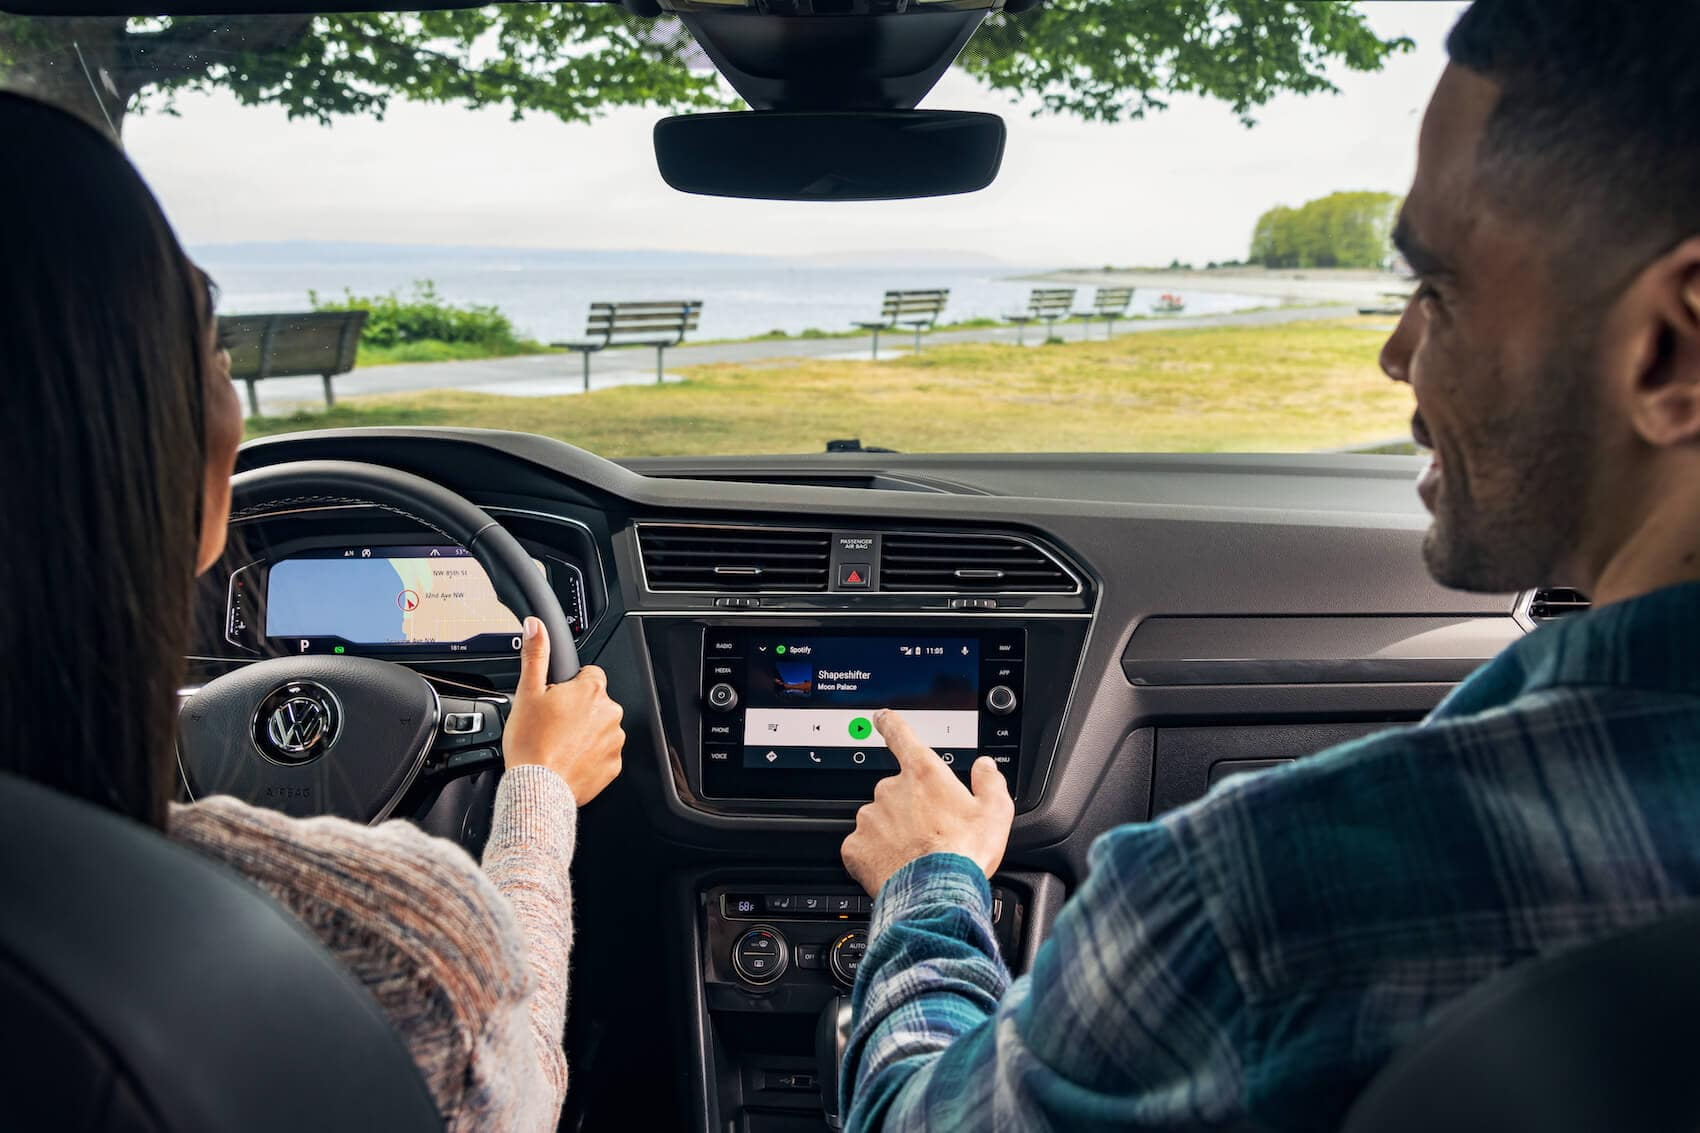 2020 Volkswagen Tiguan interior comparison Littleton, CO